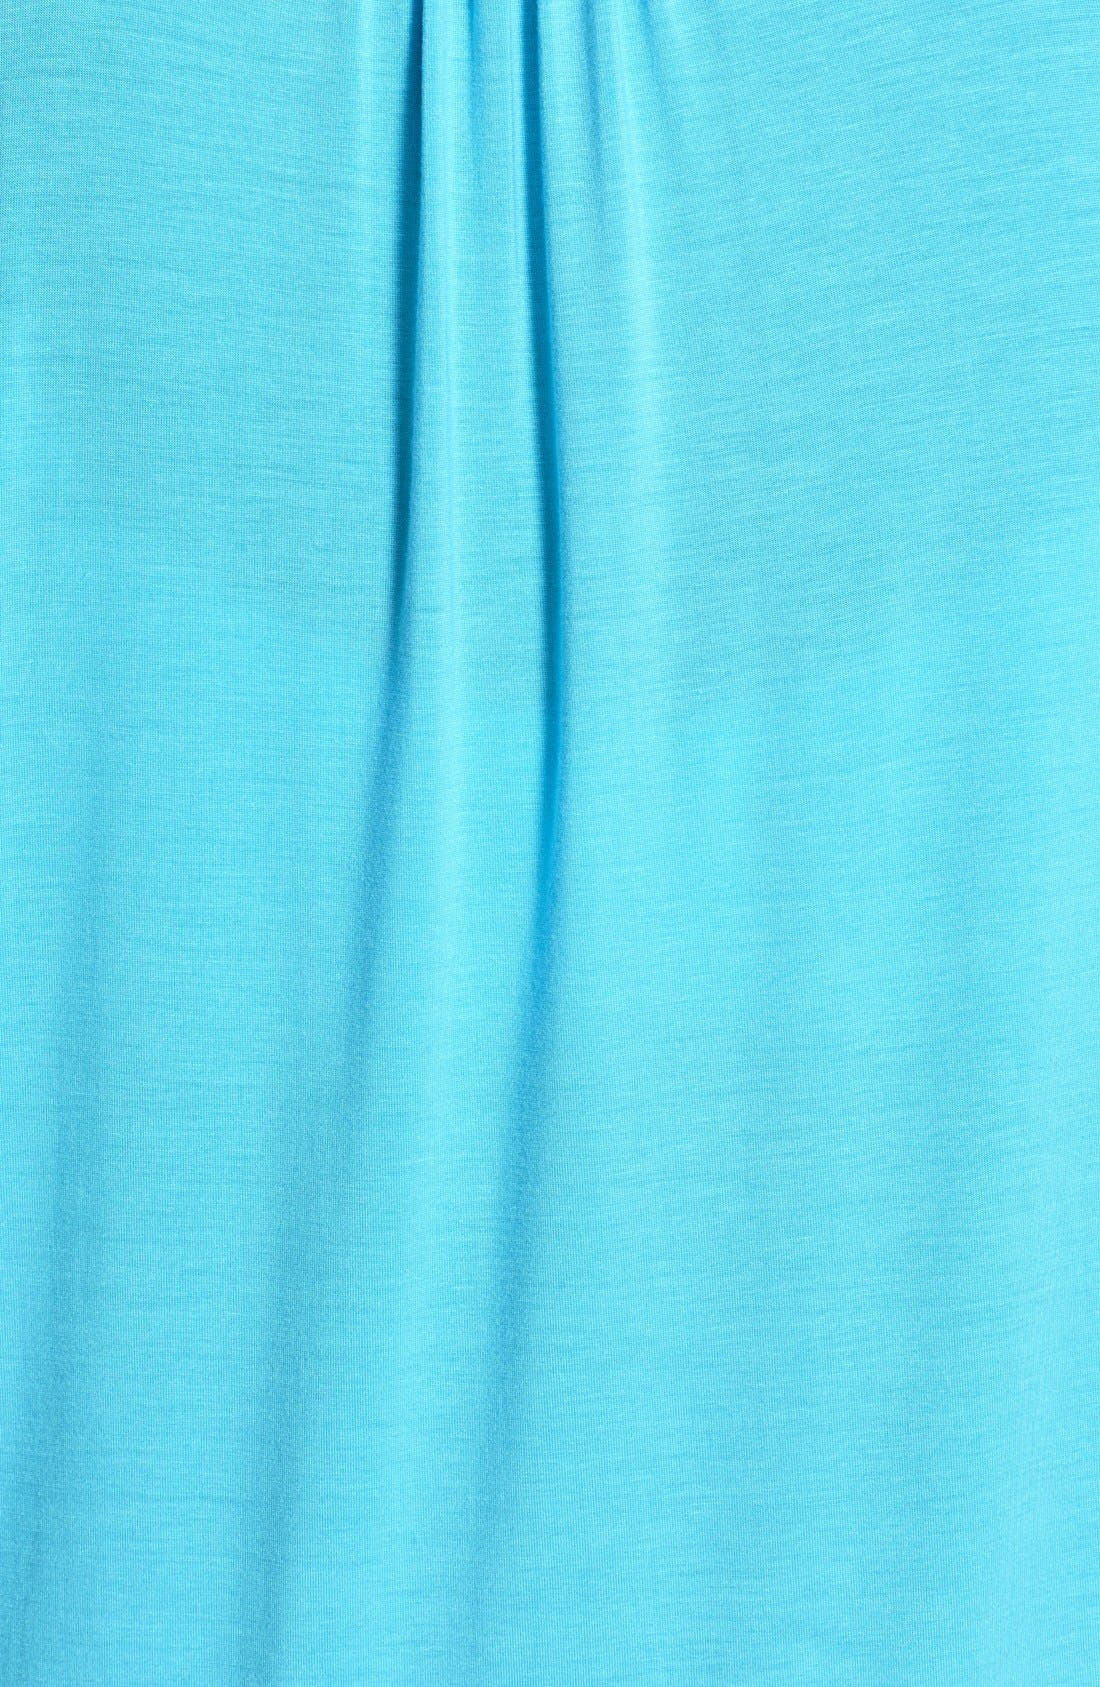 Alternate Image 3  - Midnight by Carole Hochman 'Magic Moment' Sleep Shirt (Plus Size)